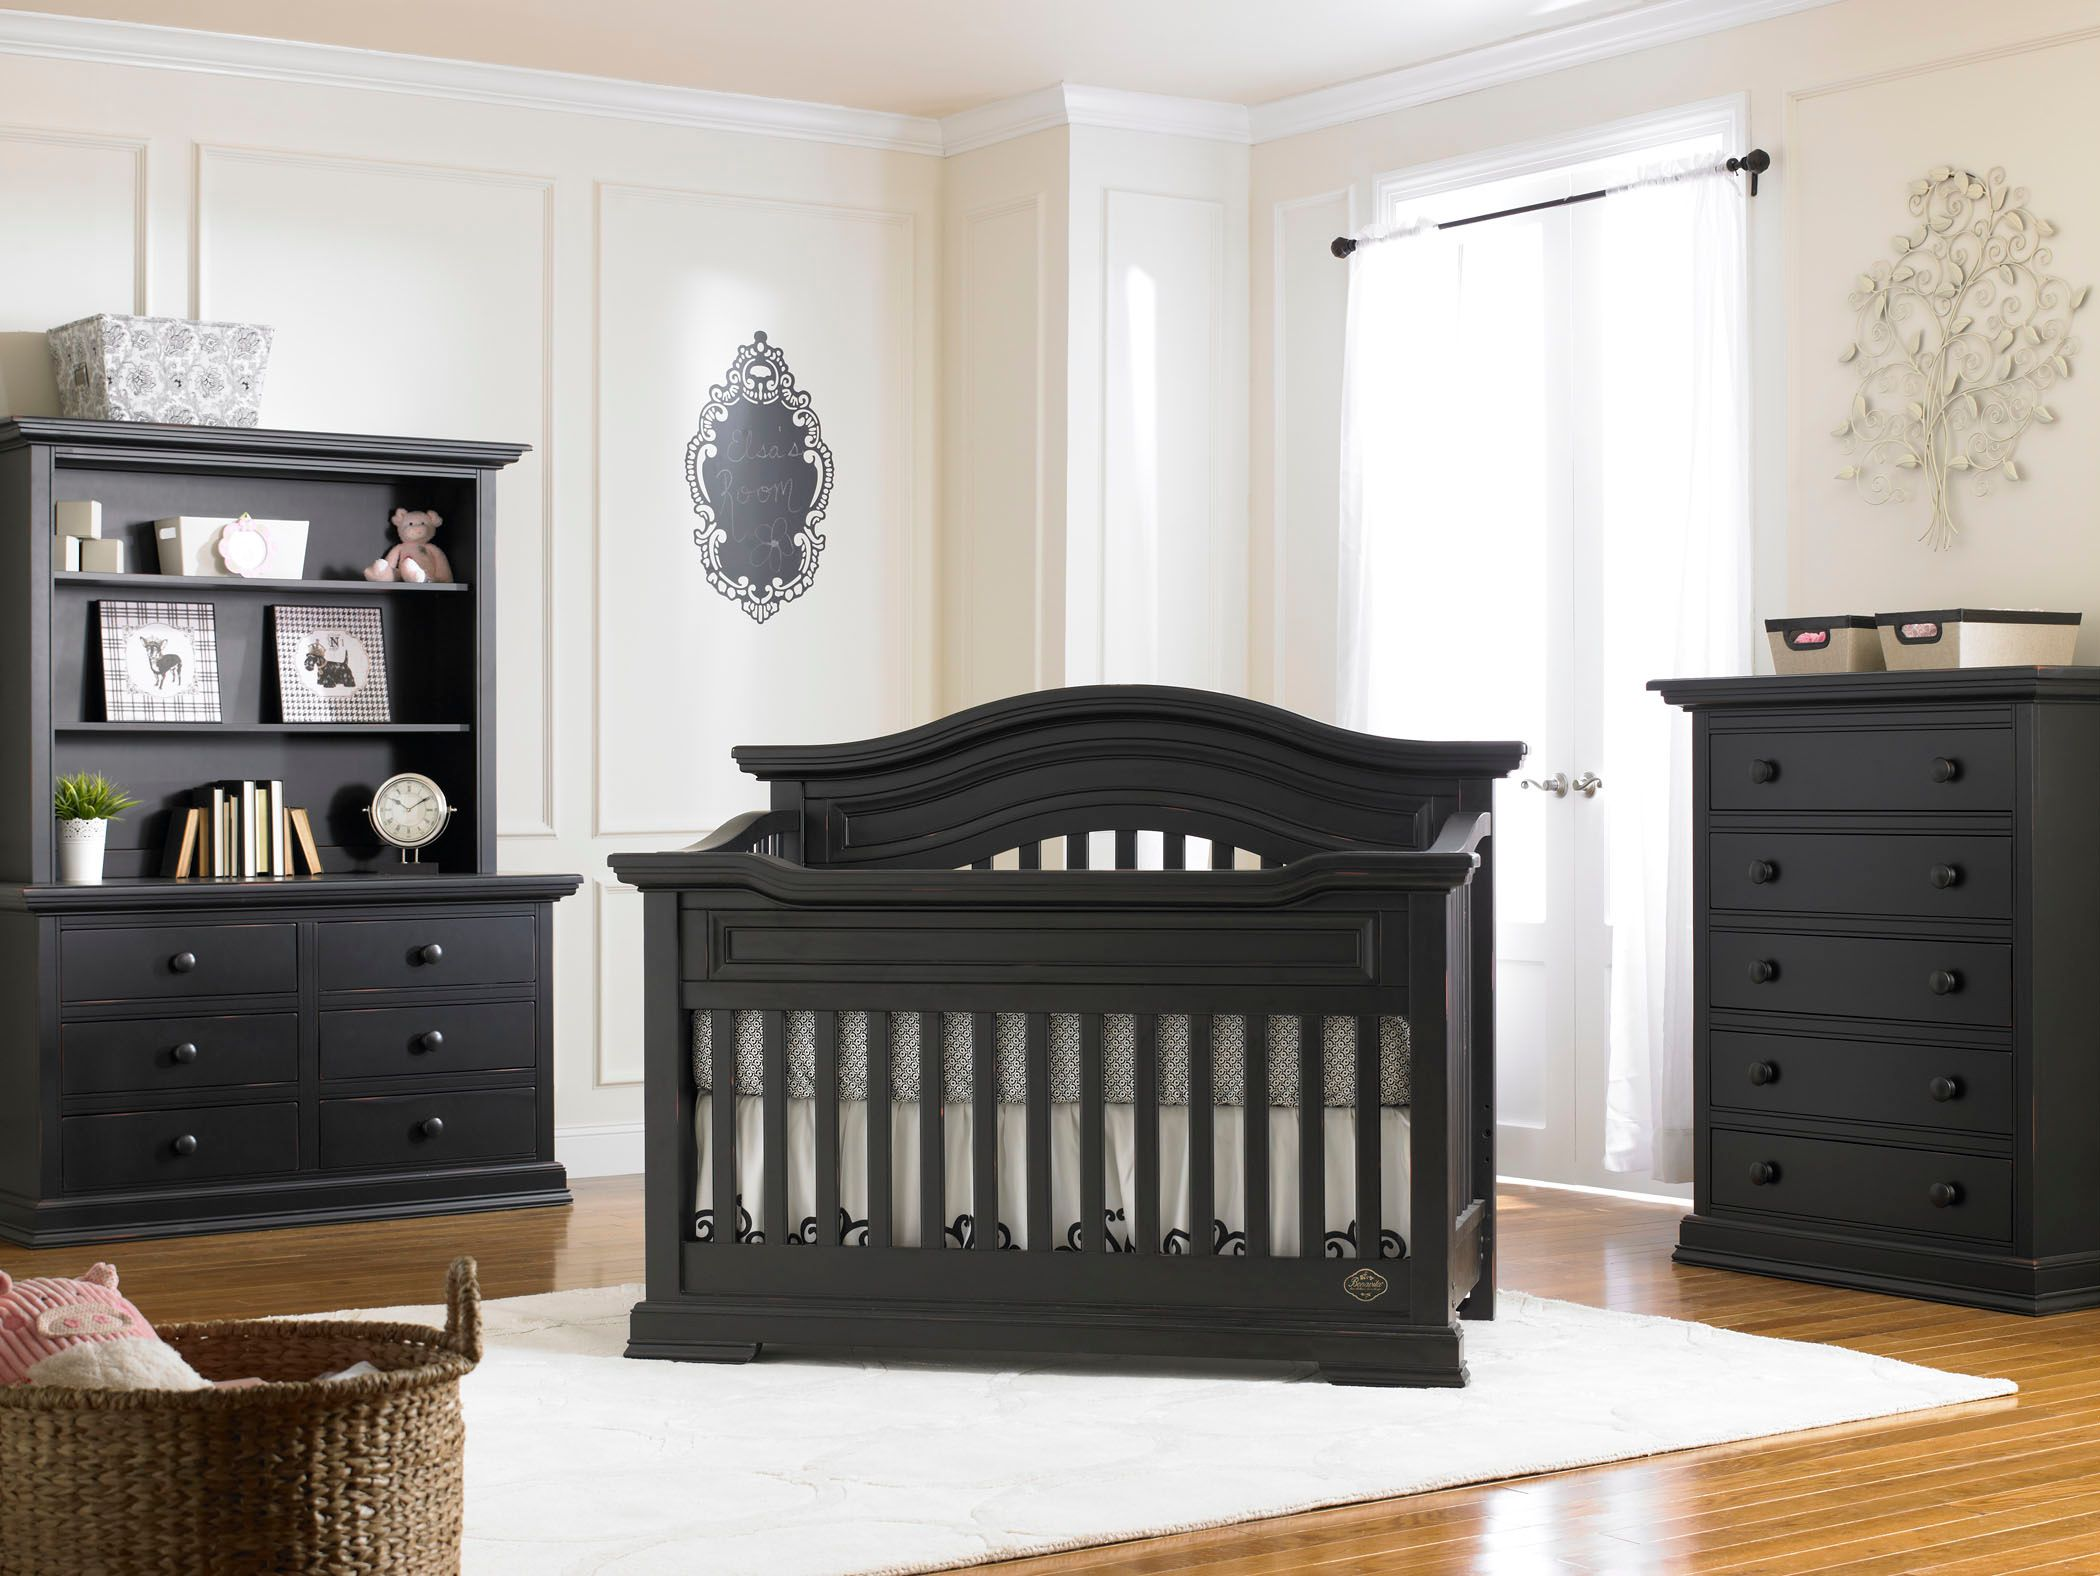 Bonavita crib for sale used - Belmont Lifestyle Crib From Bonavita Collection Will Revolutionize Your Baby S Room Built To Grow 4